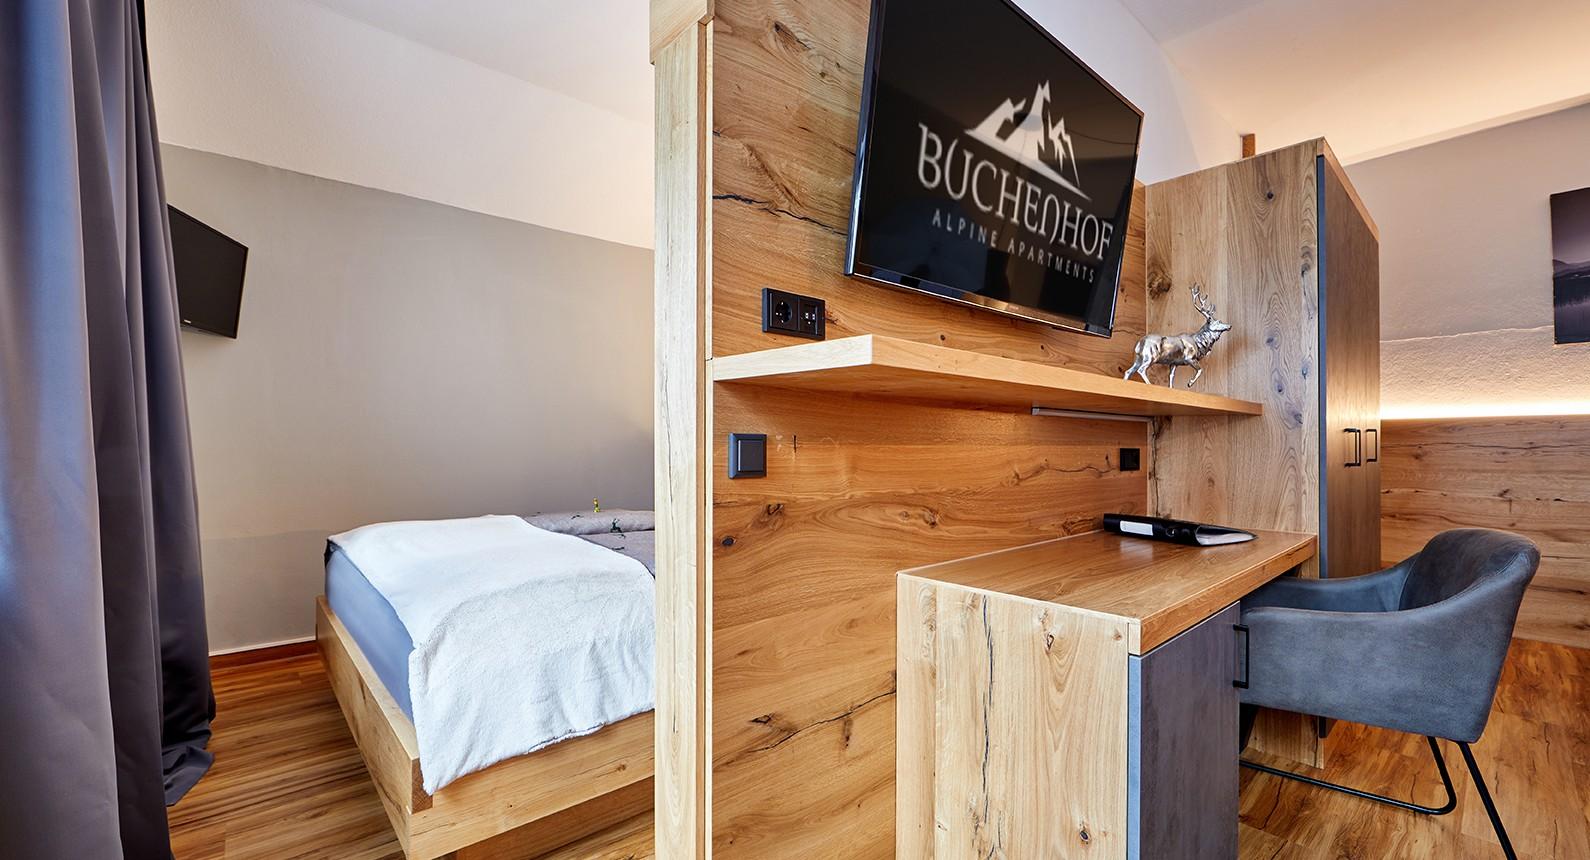 Buchenhof-Apartment-D_05